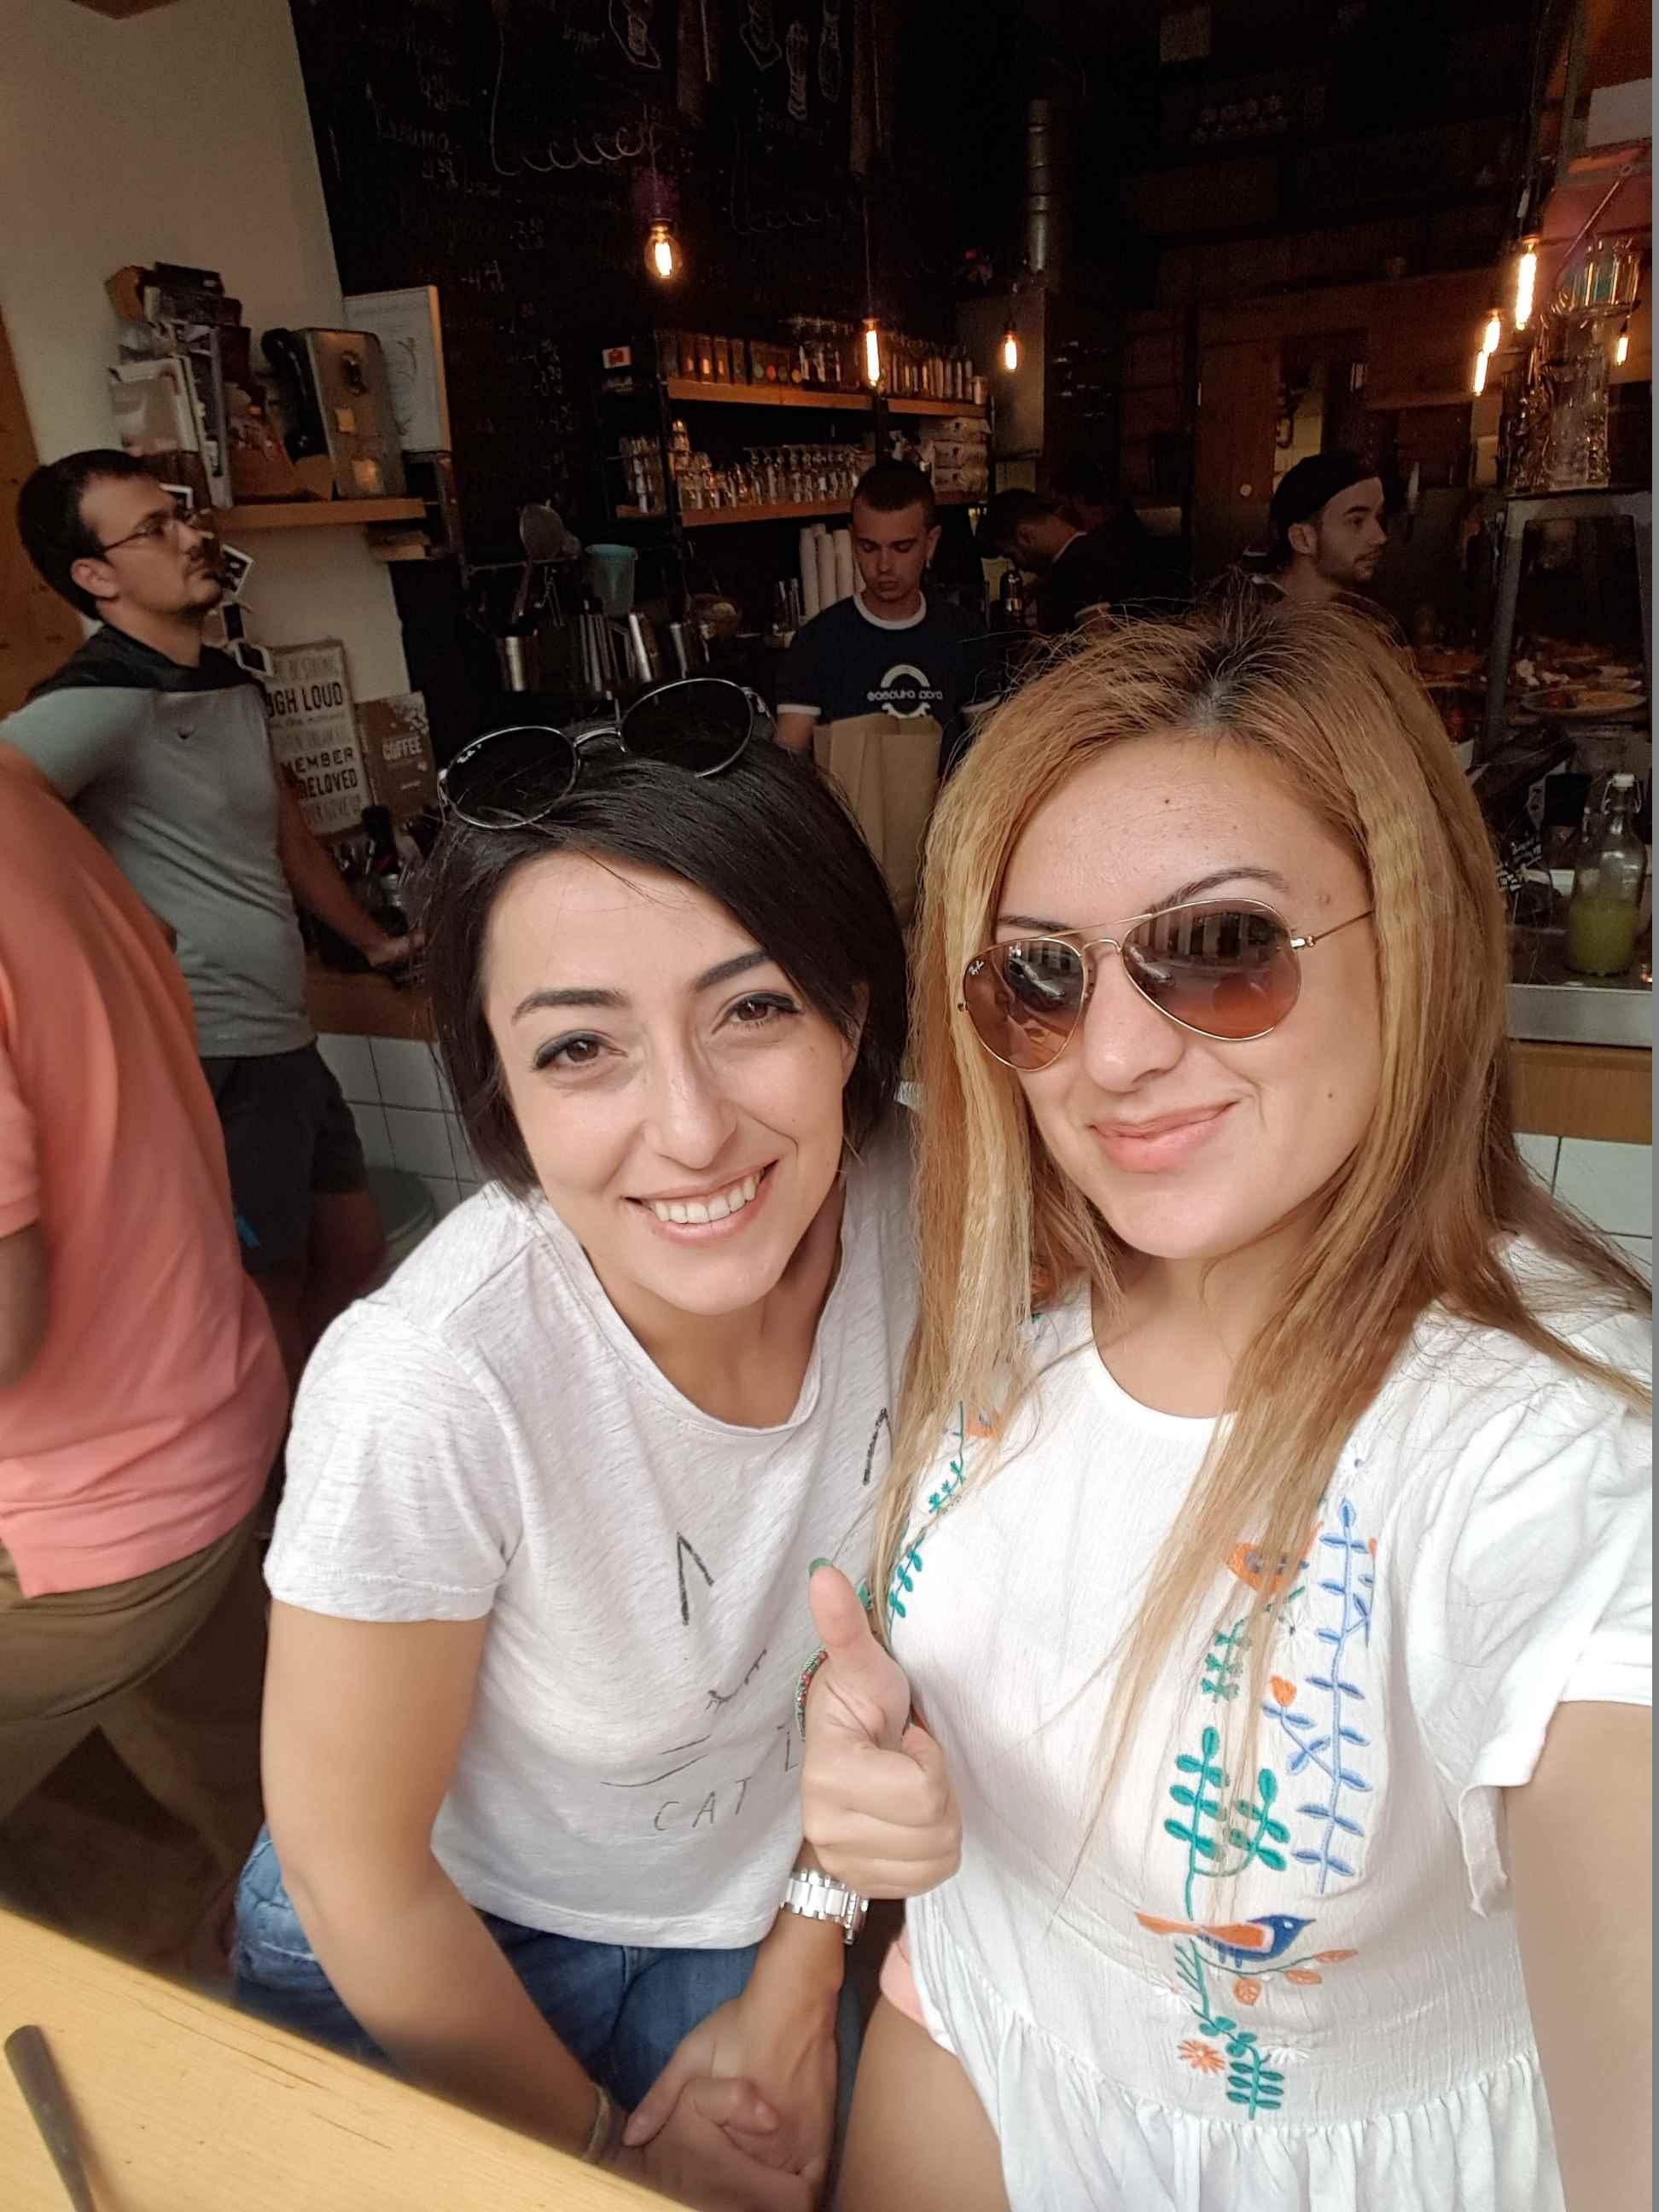 yesempatik-sofya-yeme-icme-mekan-bulgaristan-fabrika-daga-blogger